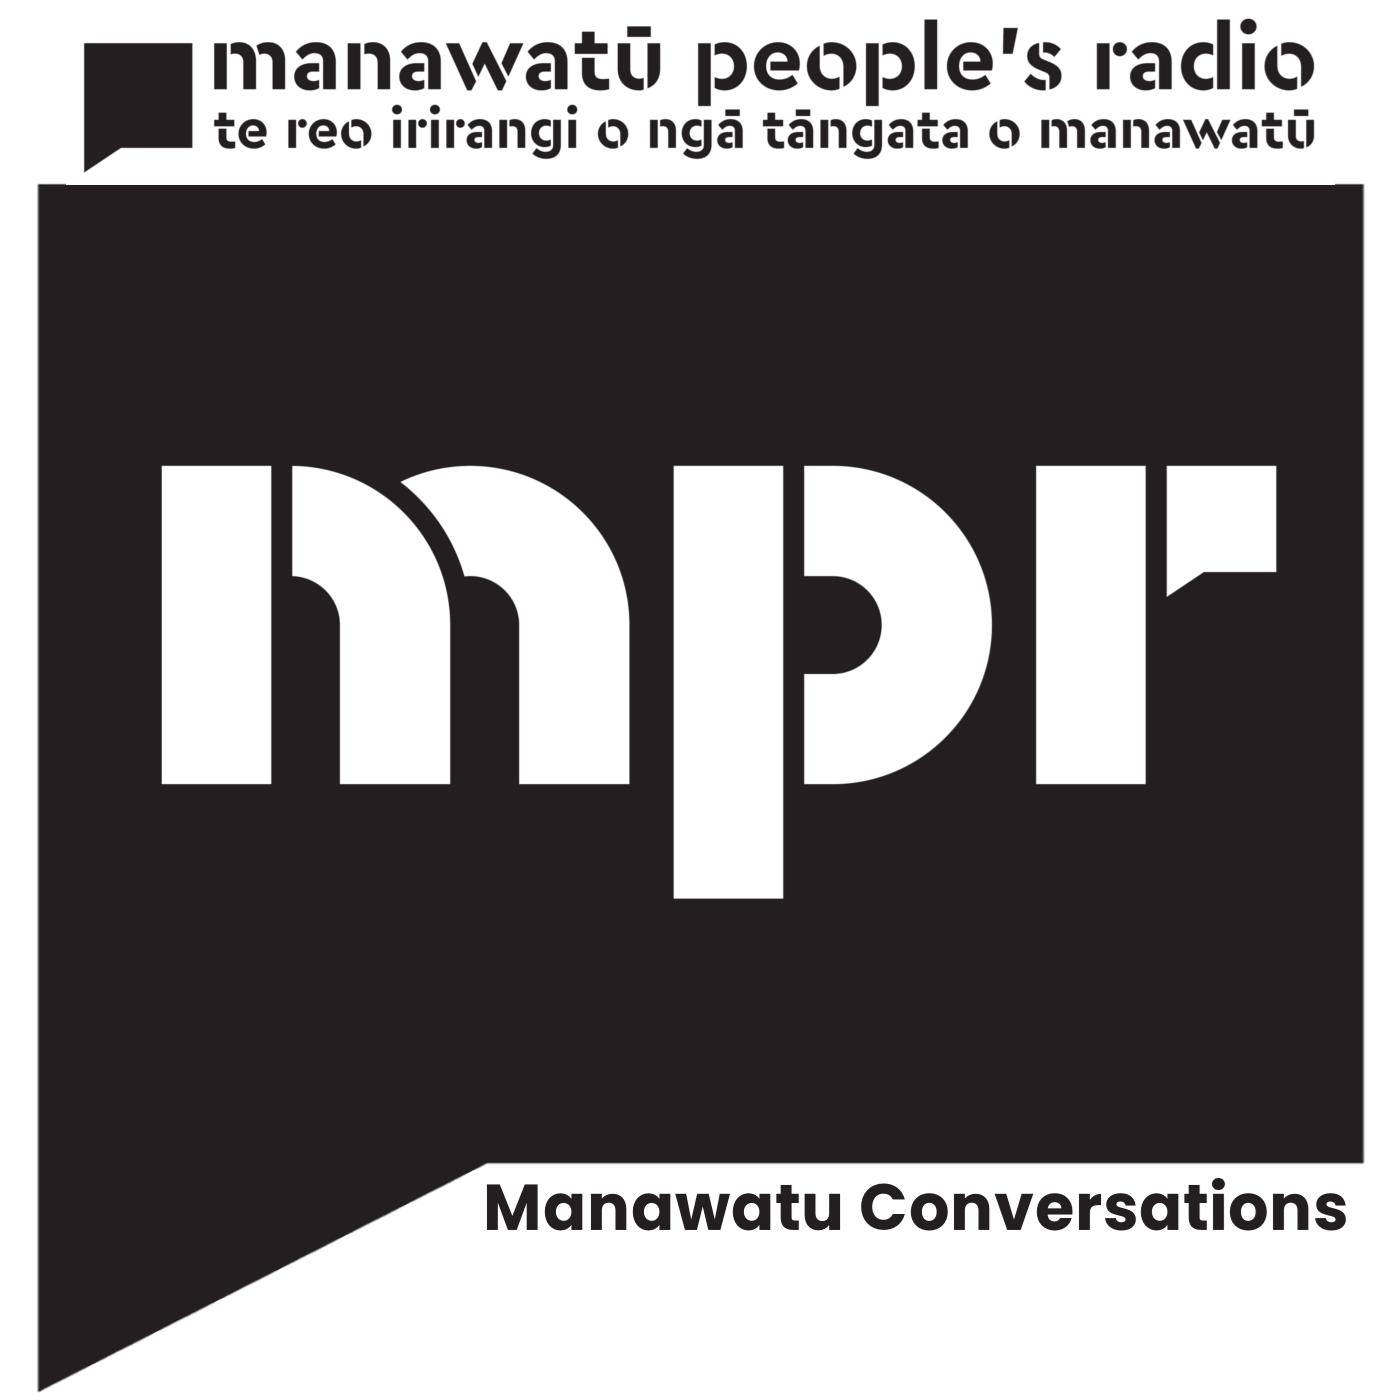 https://static.accessradio.org/StationFolder/manawatu/Images/MPR - ManawatuConv.png